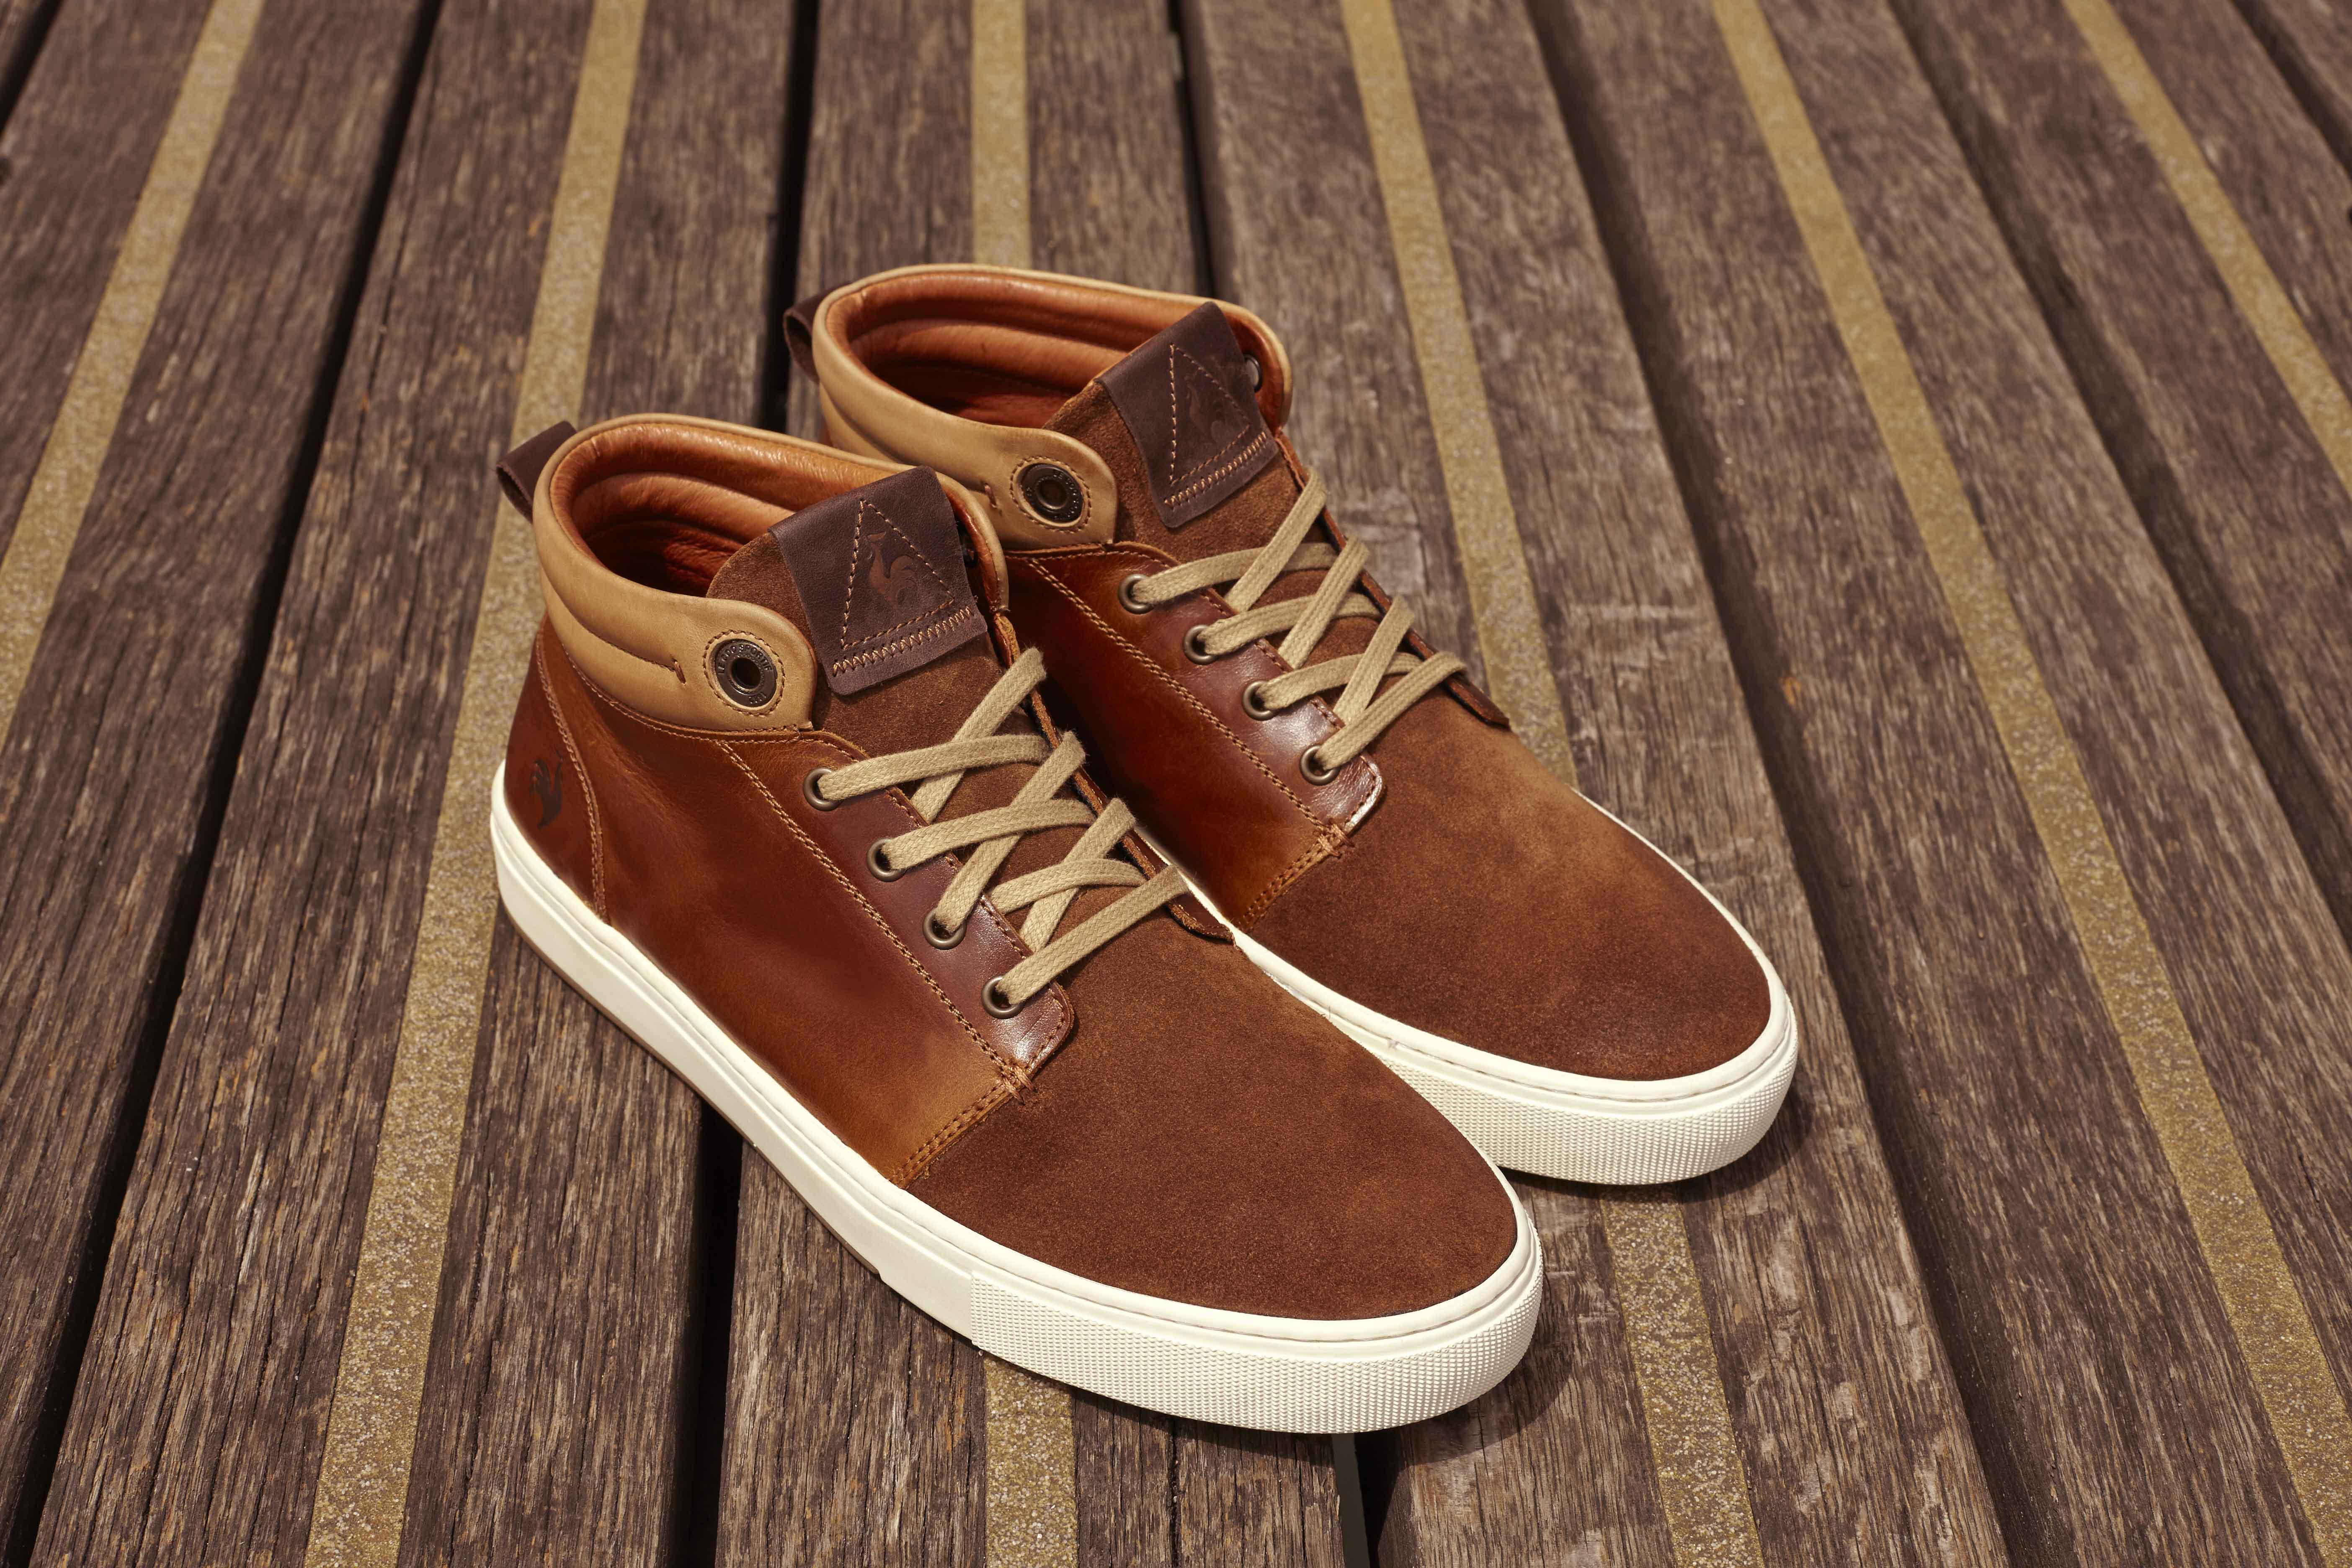 Sneakers Le Coq Sportif Chaligny marron